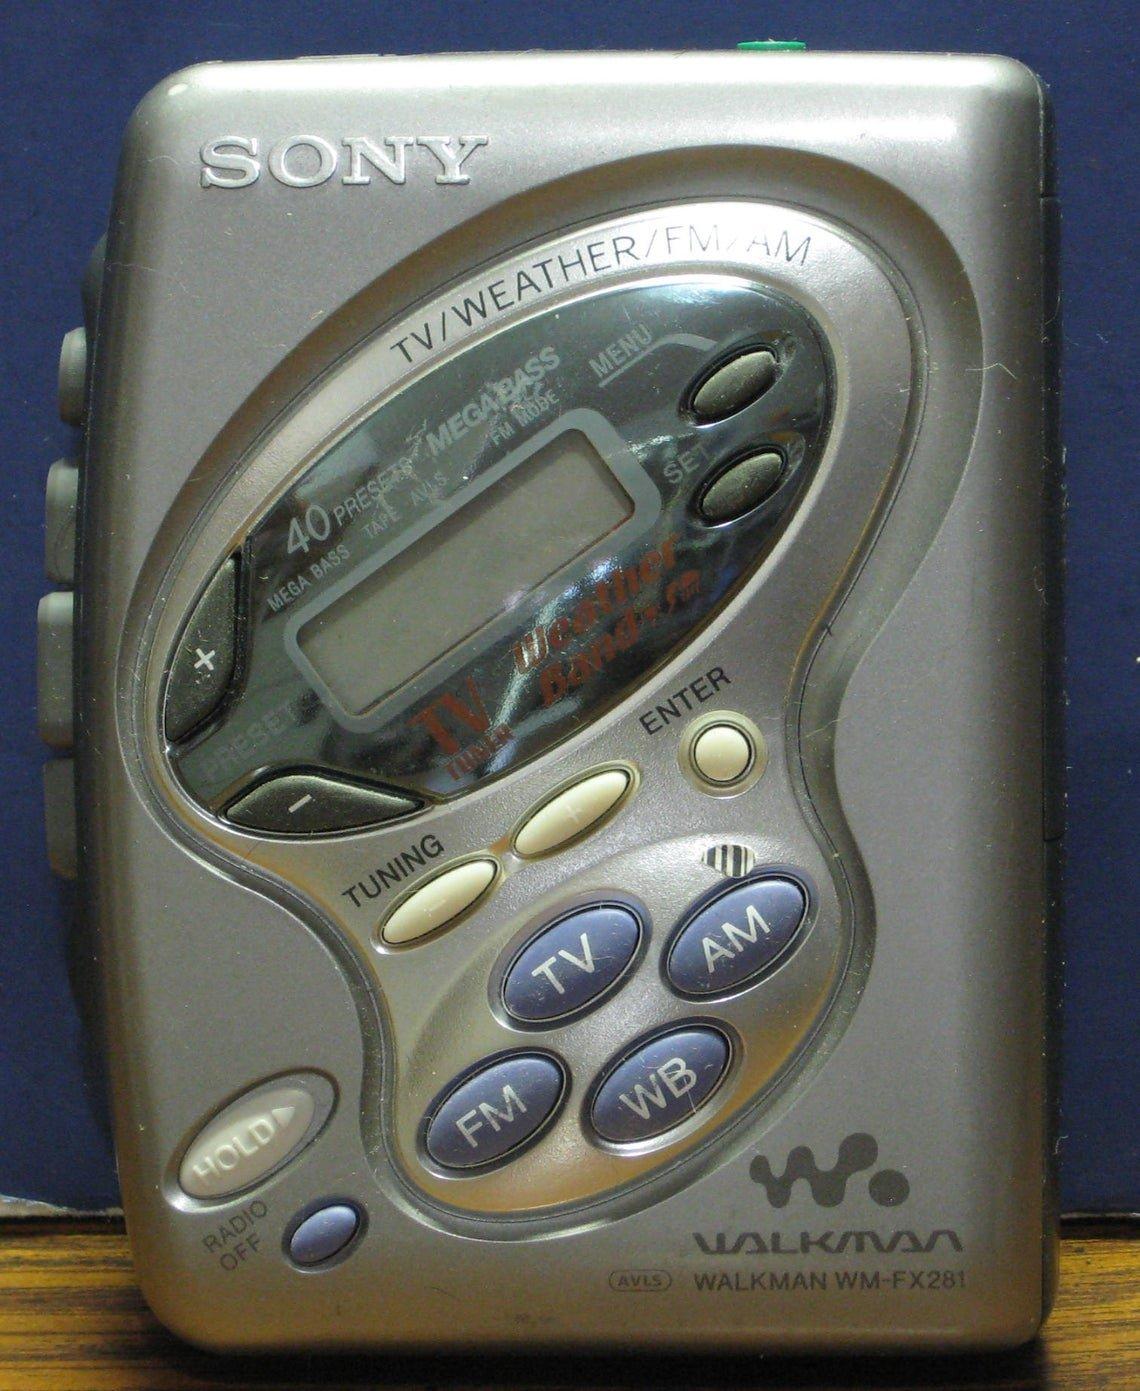 Sony Walkman WM-FX281 Cassette Player Radio - FM AM TV Band Weather Band - 1995 Vintage